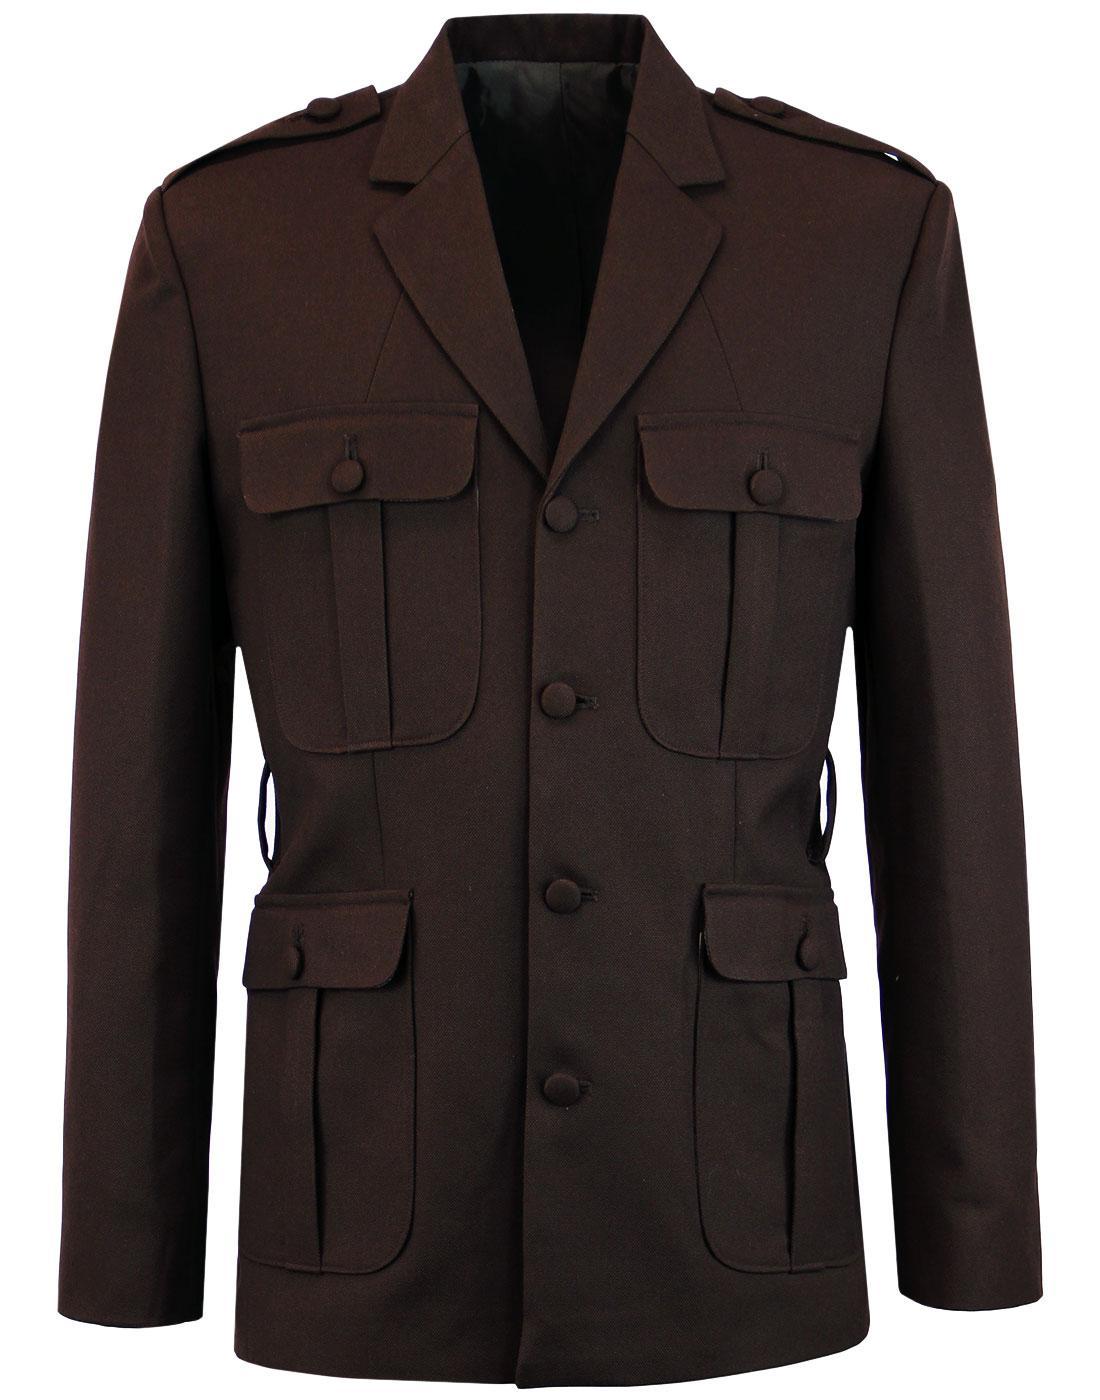 MADCAP ENGLAND 60s Mod Hopsack Safari Jacket BROWN